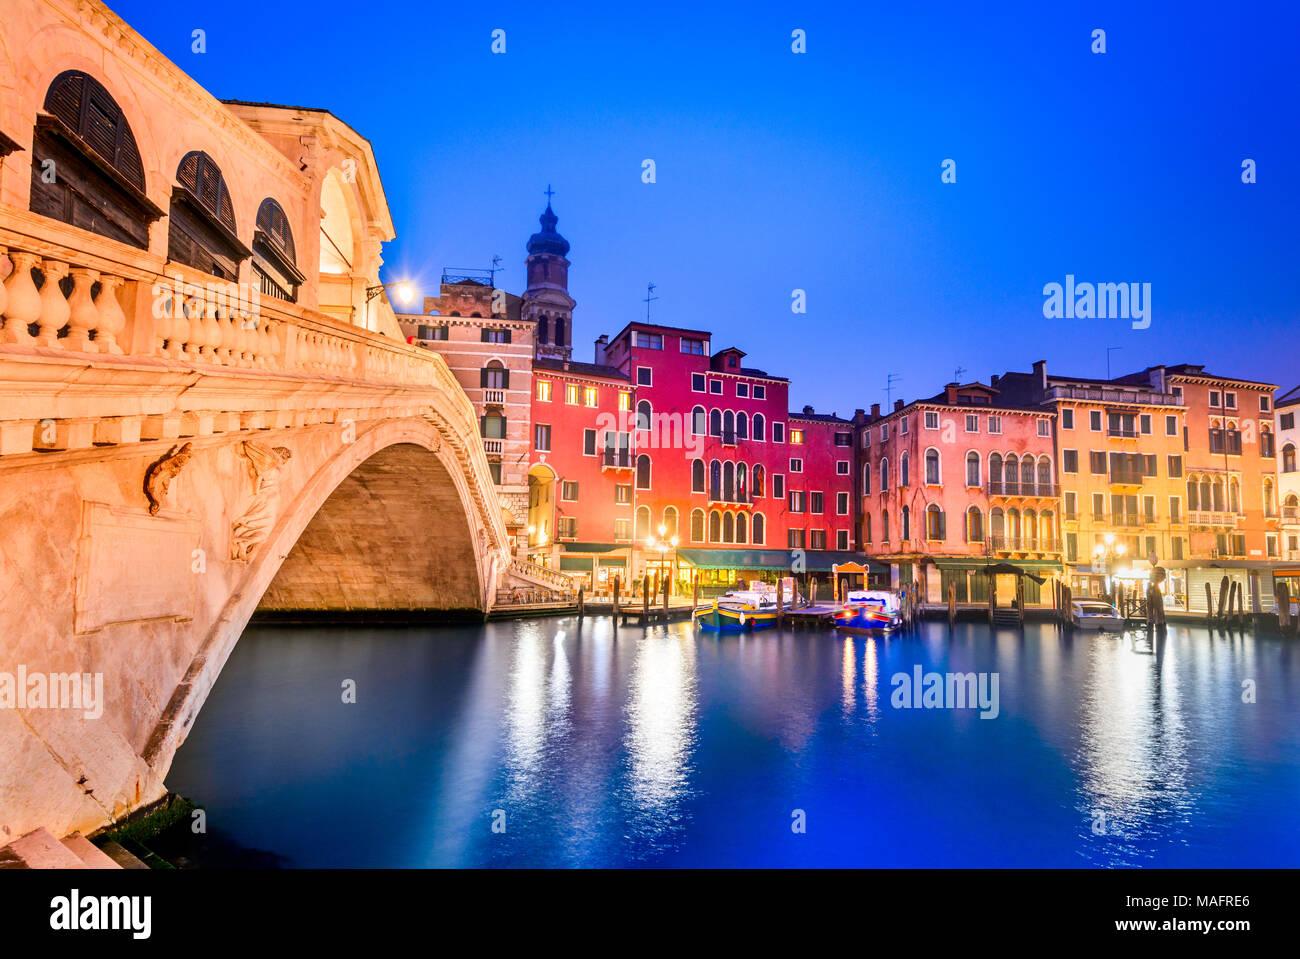 Venite, Italy  - Night image with Ponte di Rialto, oldest  bridge spanning the Grand Canal, Venezia. - Stock Image